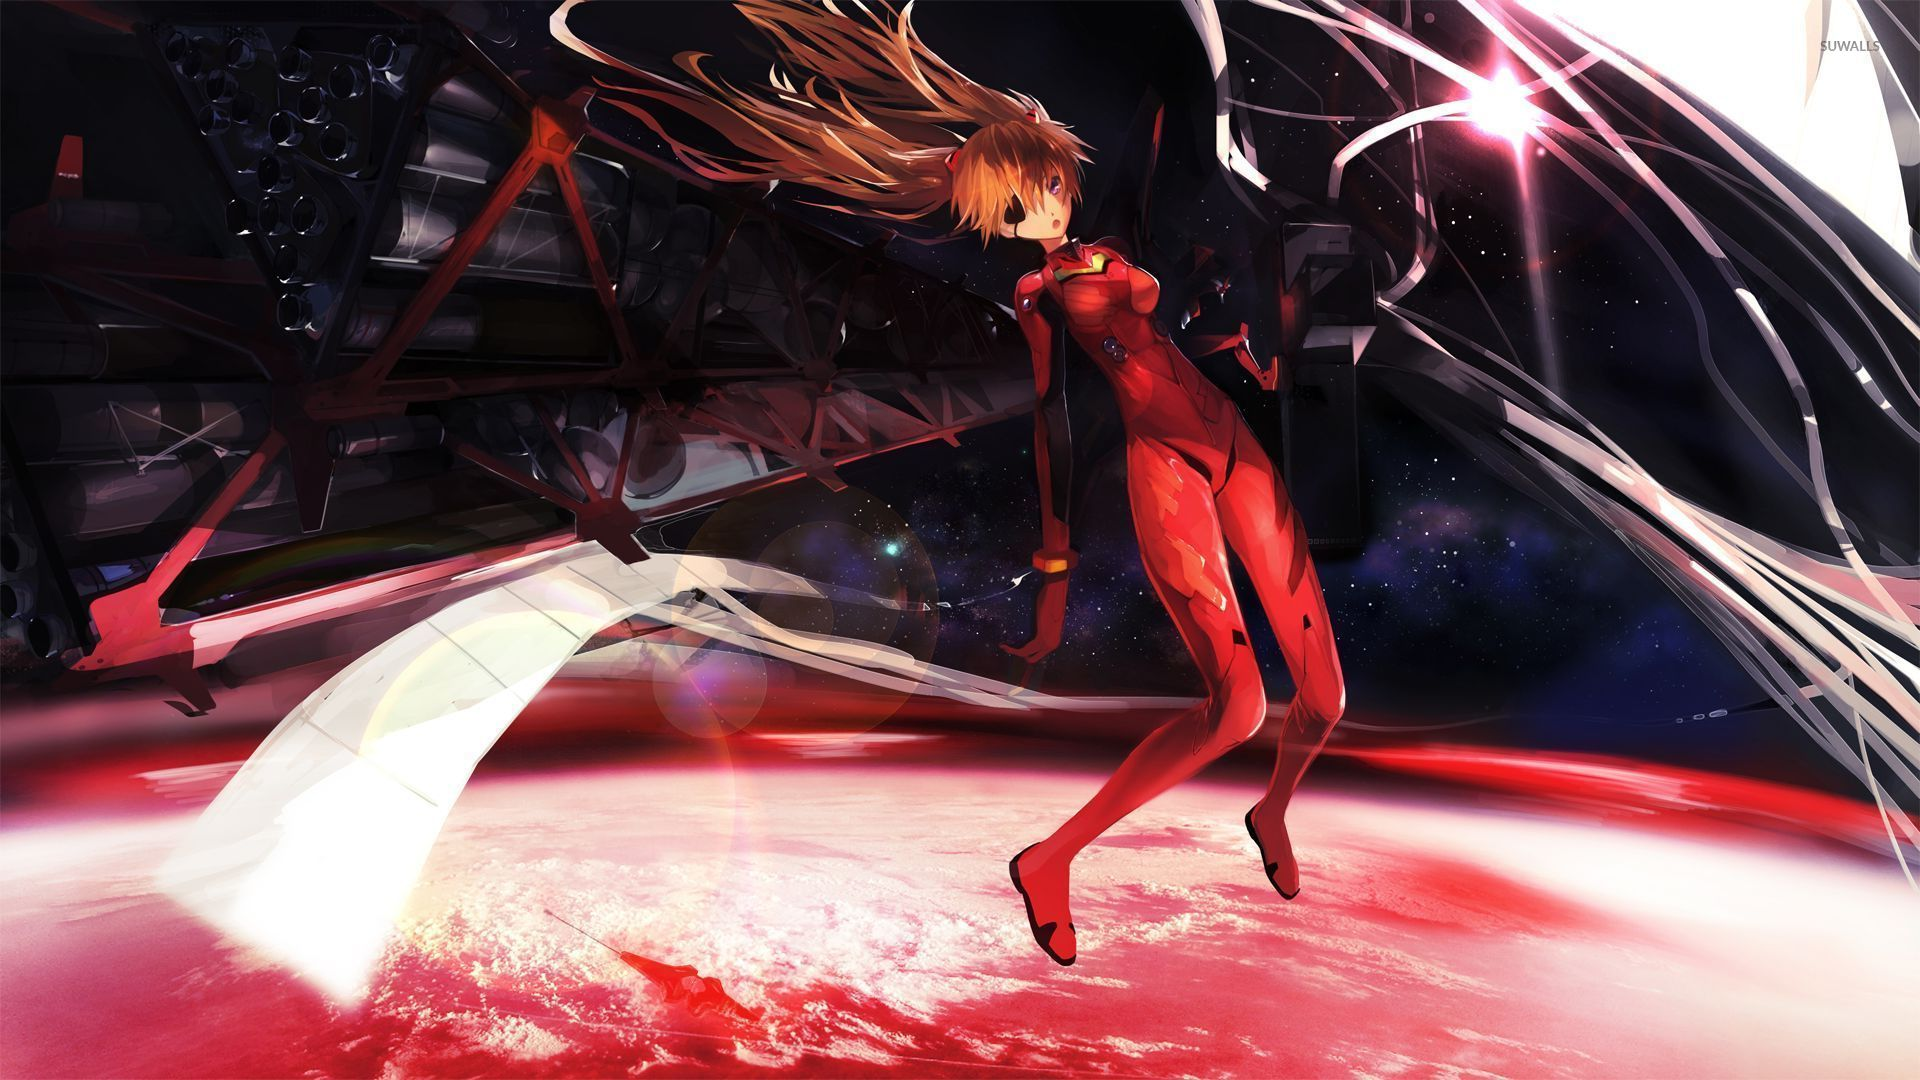 evangelion wallpaper hd anime - photo #15